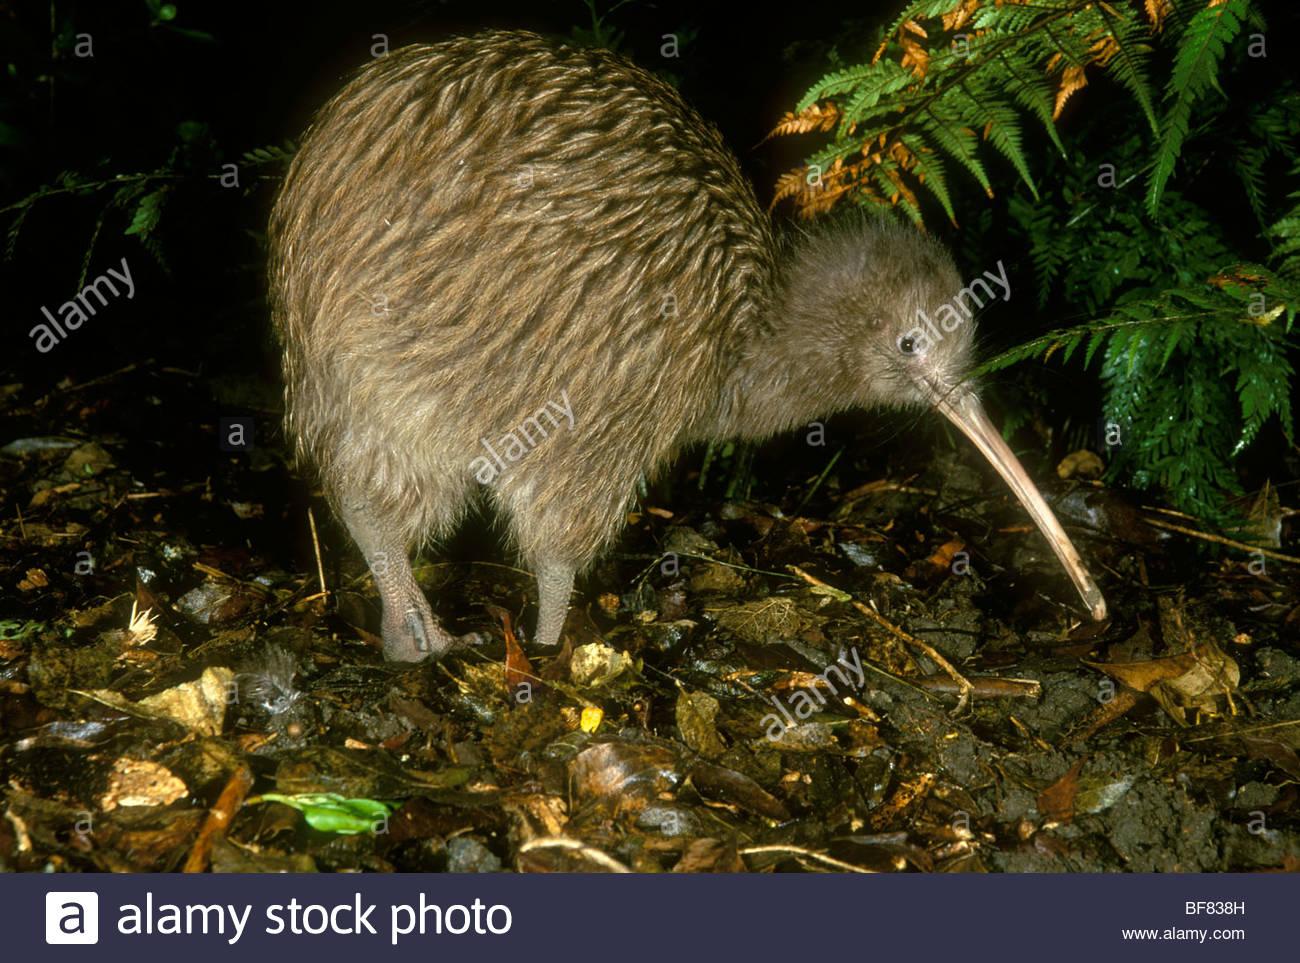 Brown kiwi foraging, Apteryx australis, New Zealand - Stock Image